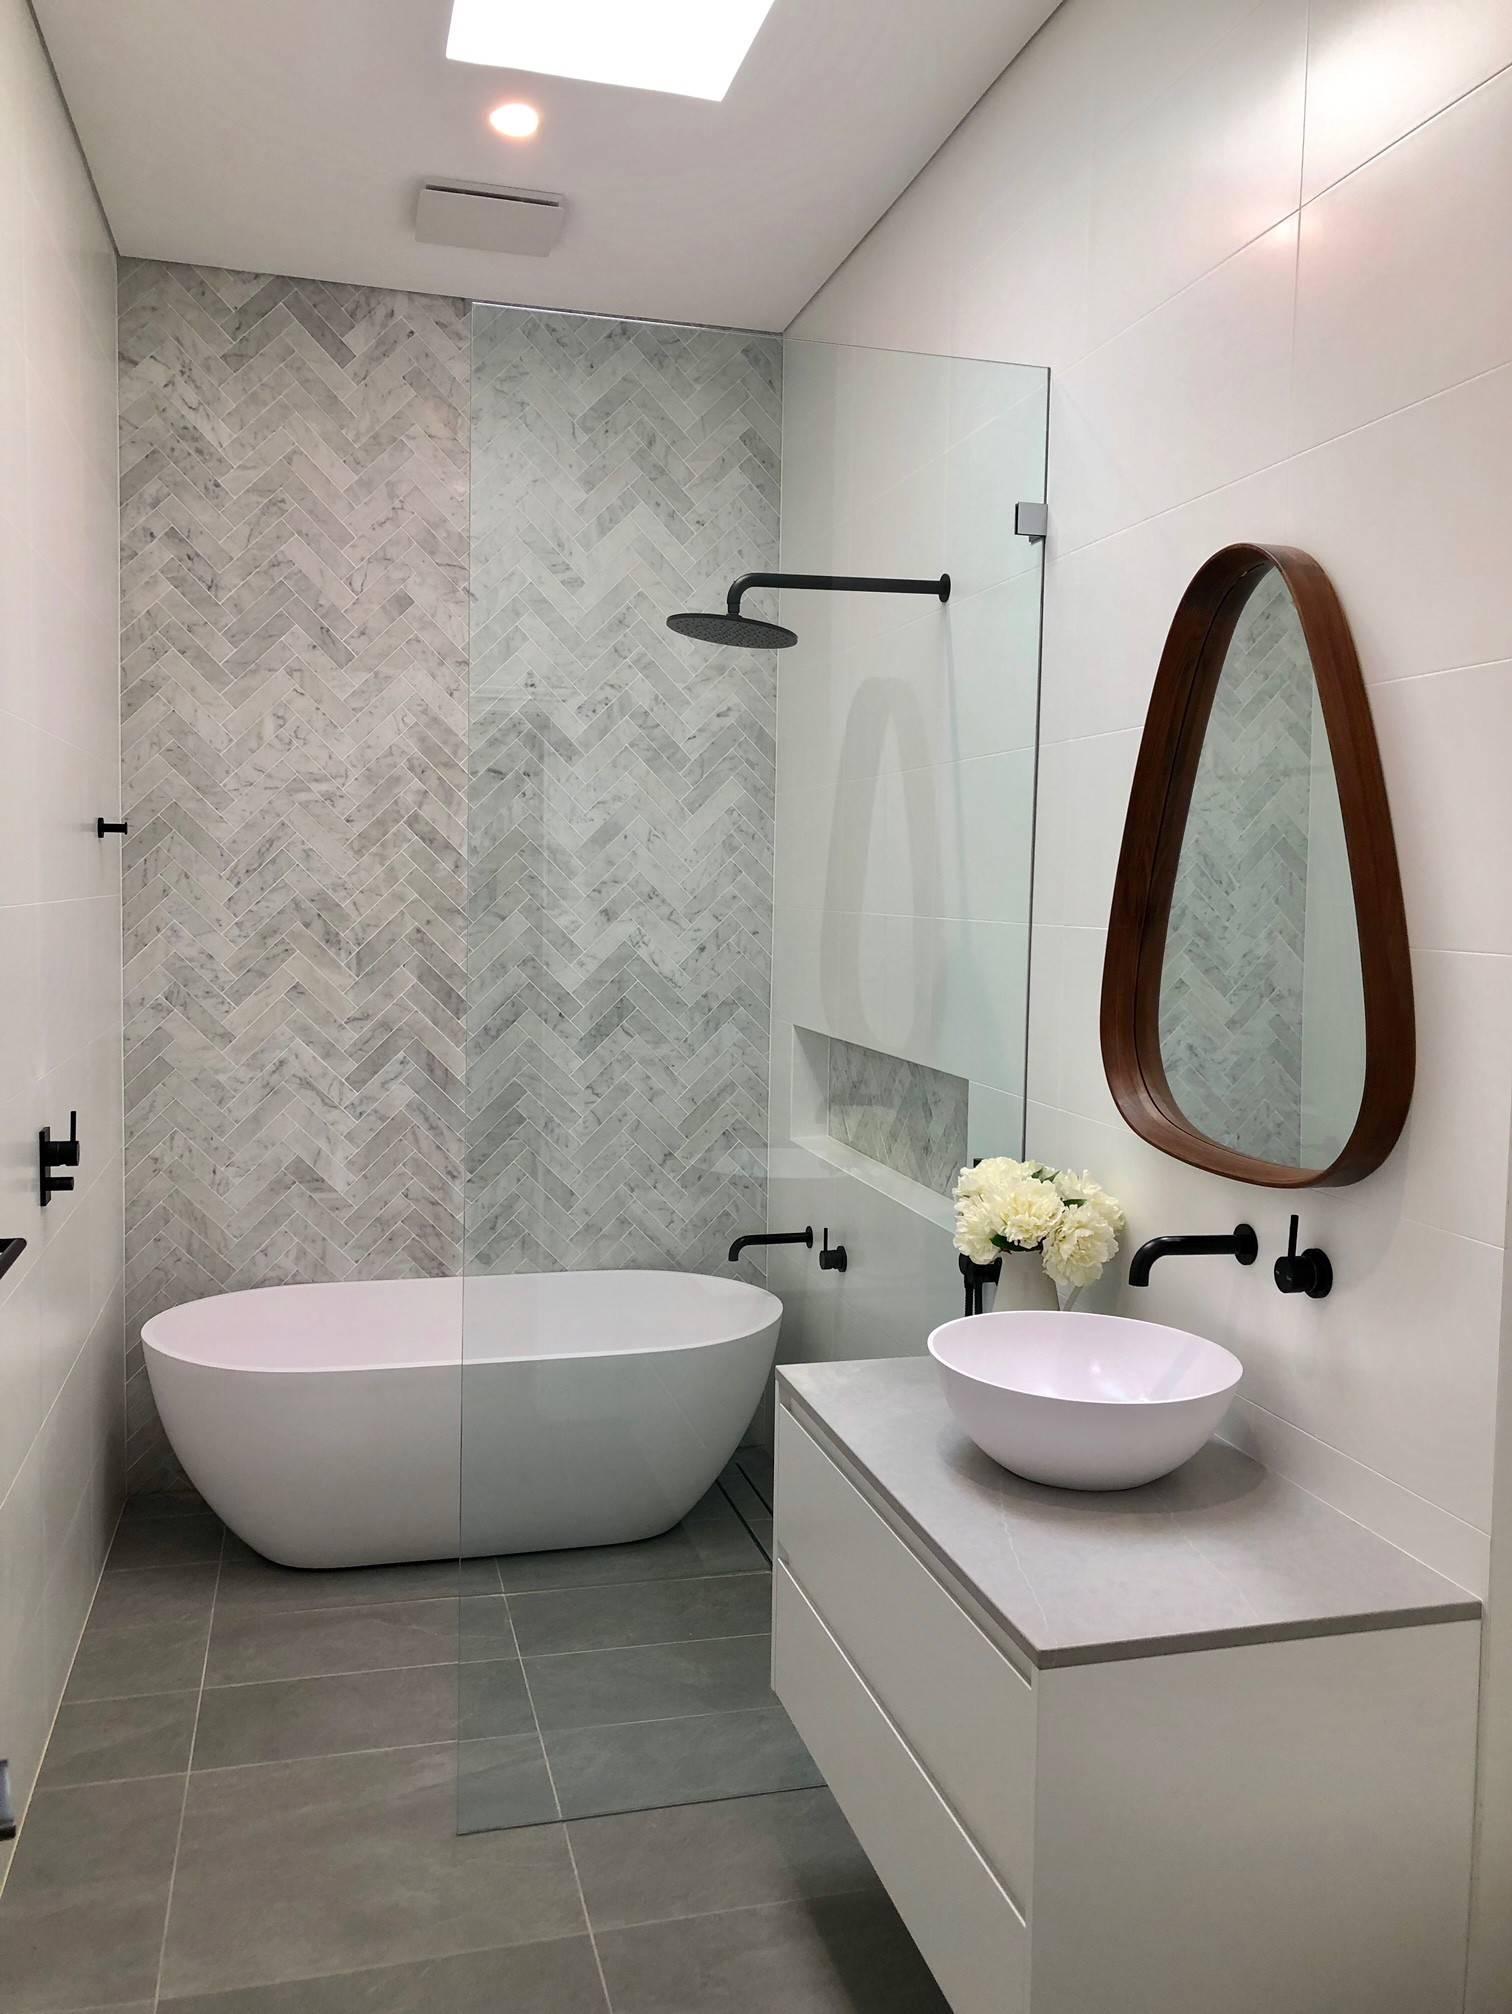 The True Costs Of Renovating A Bathroom Houzz Au Bathroom renovation cost ireland